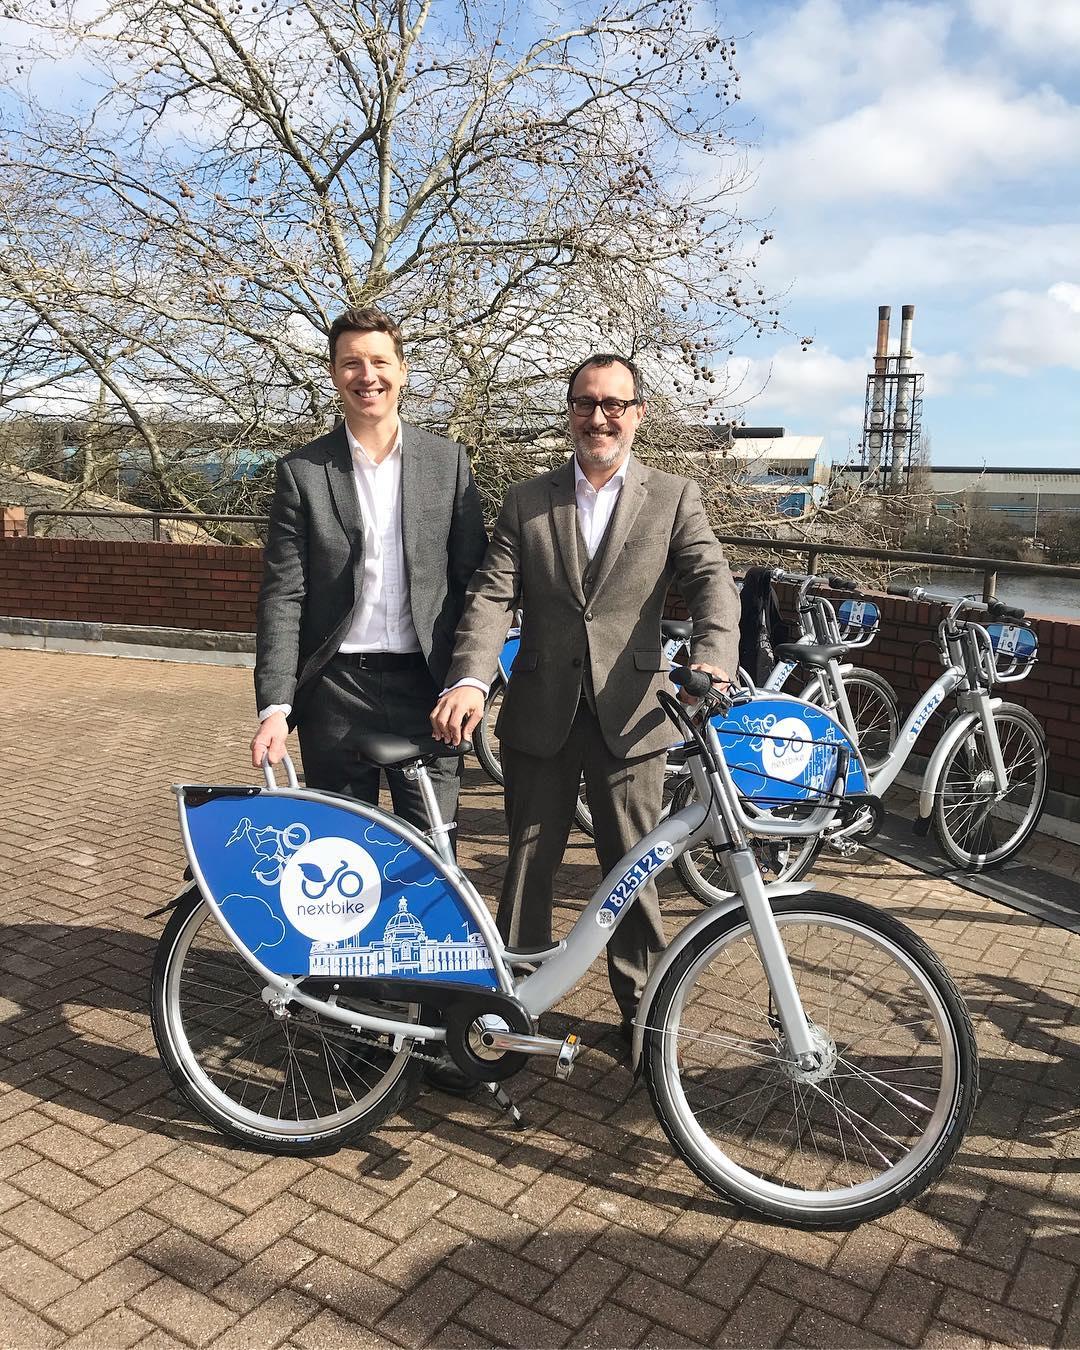 Bike hire scheme arrives in Cardiff